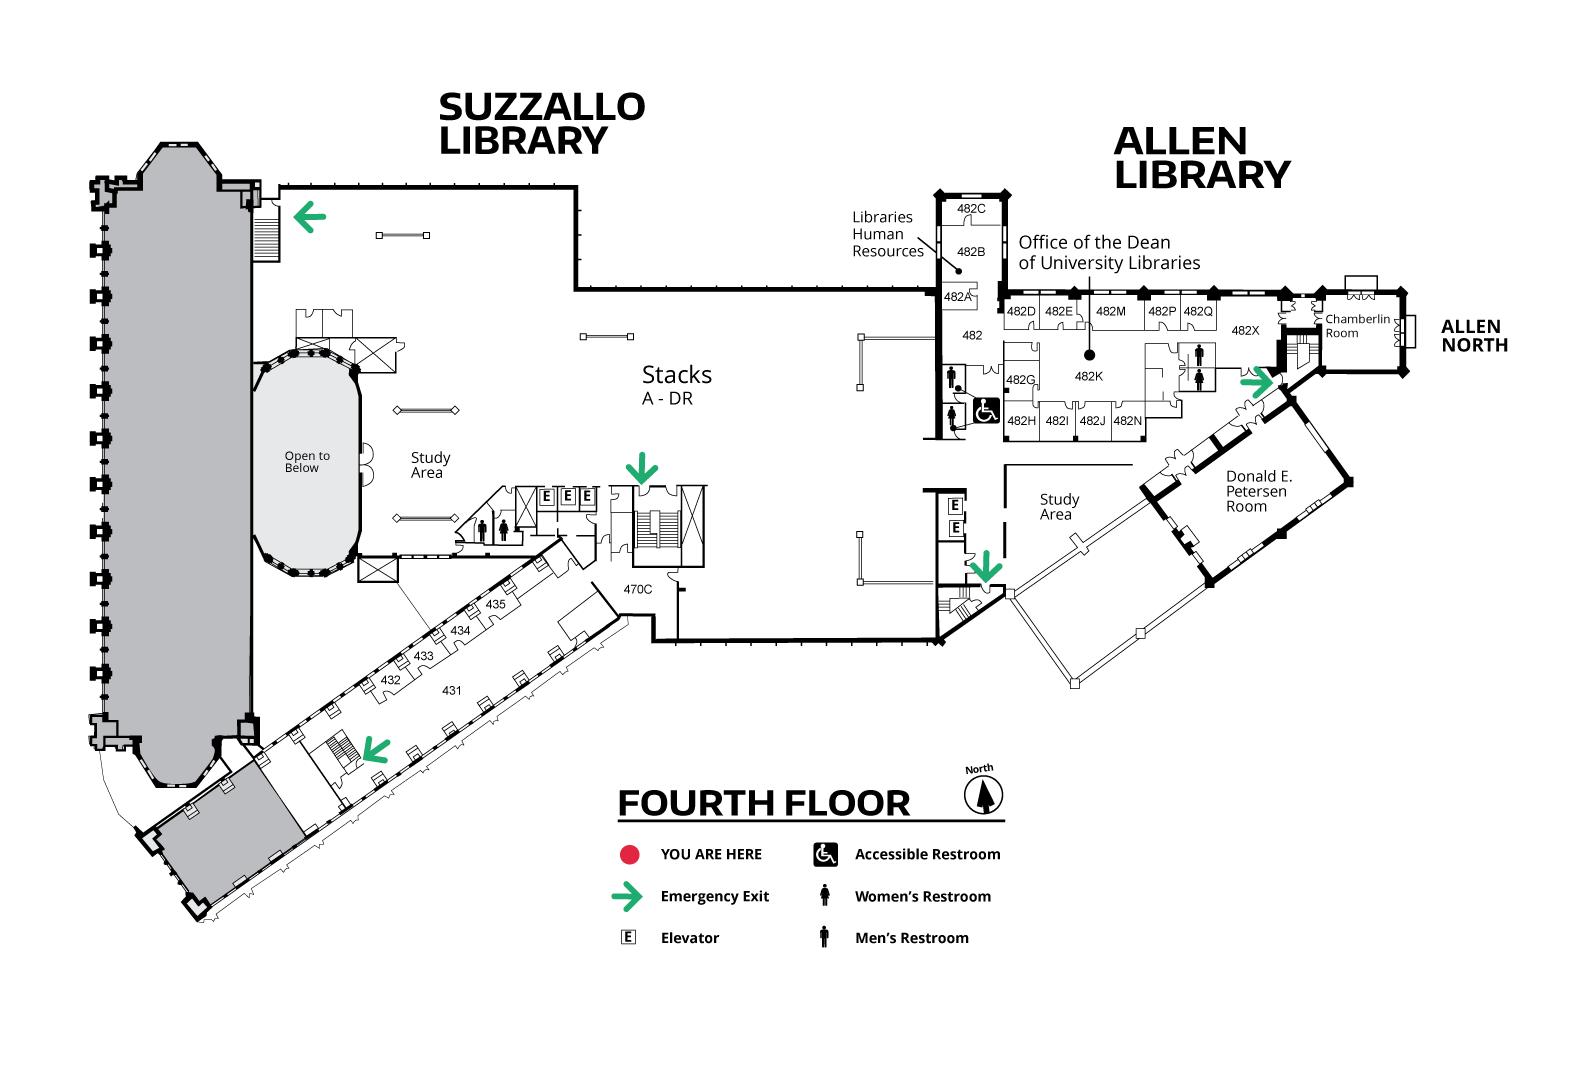 Suzzallo and Allen Fourth Floor Map